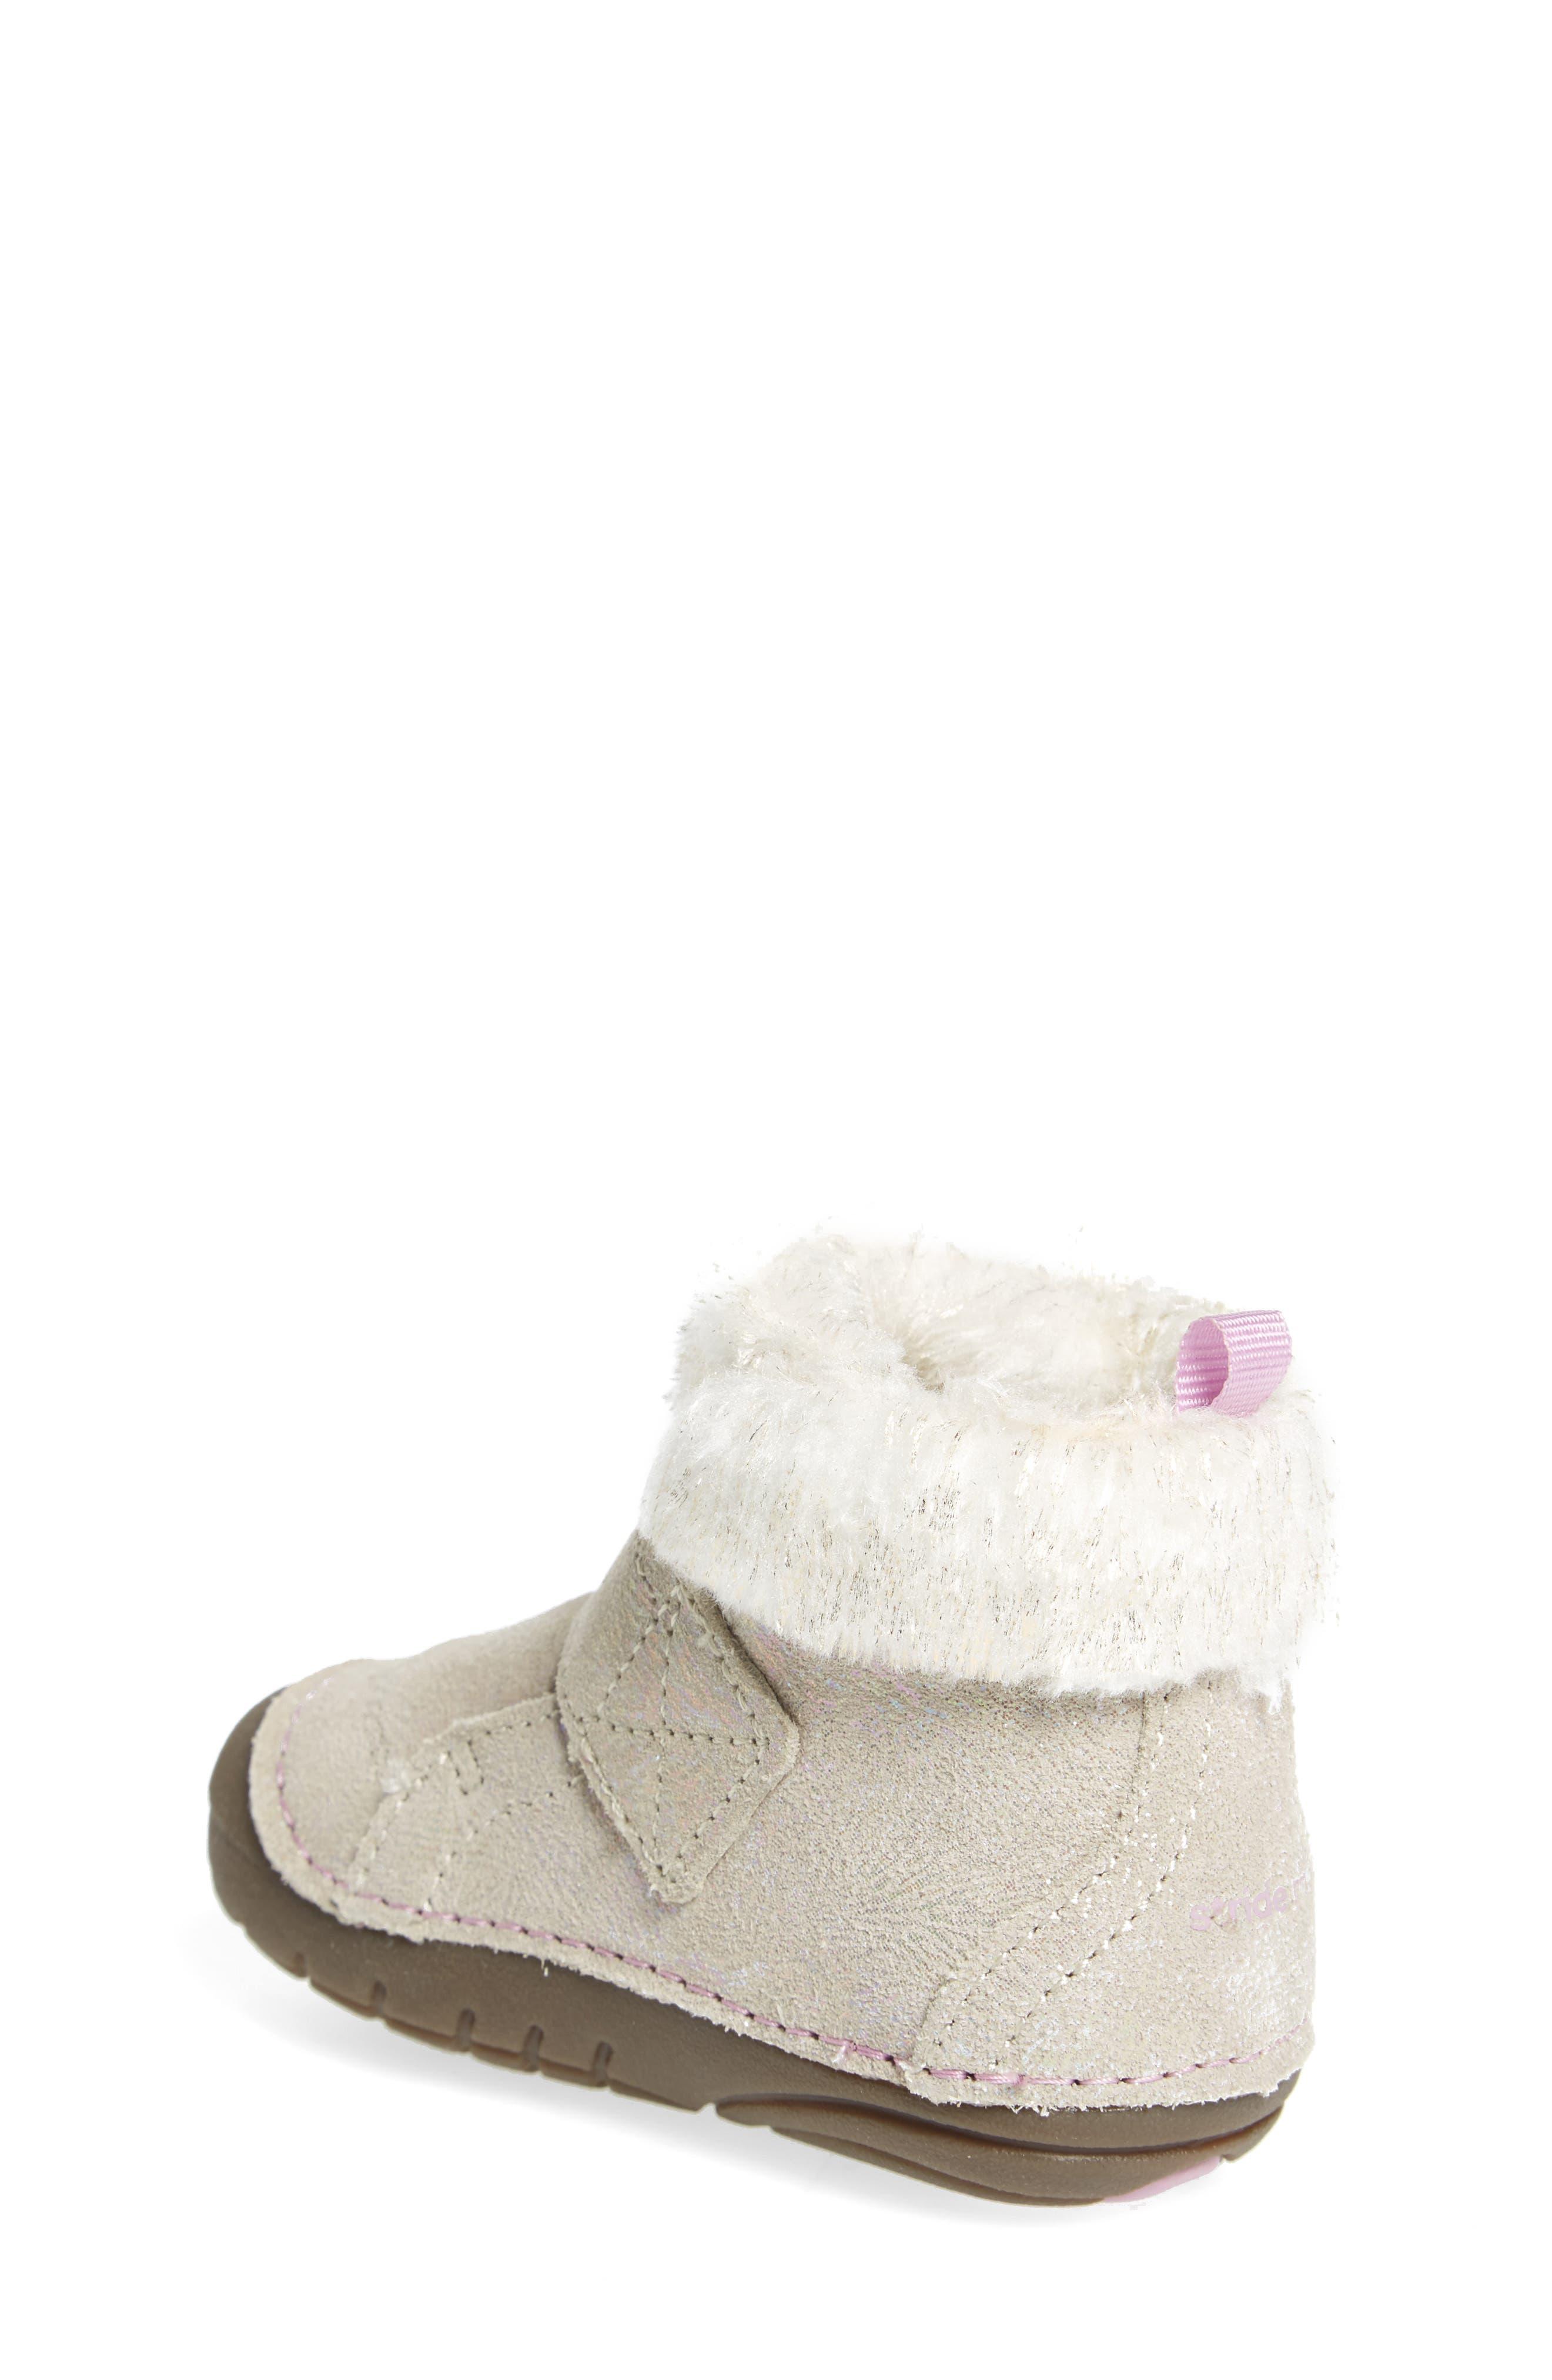 Alternate Image 2  - Stride Rite Soft Motion™ Sophie Faux Fur Bootie (Baby & Walker)